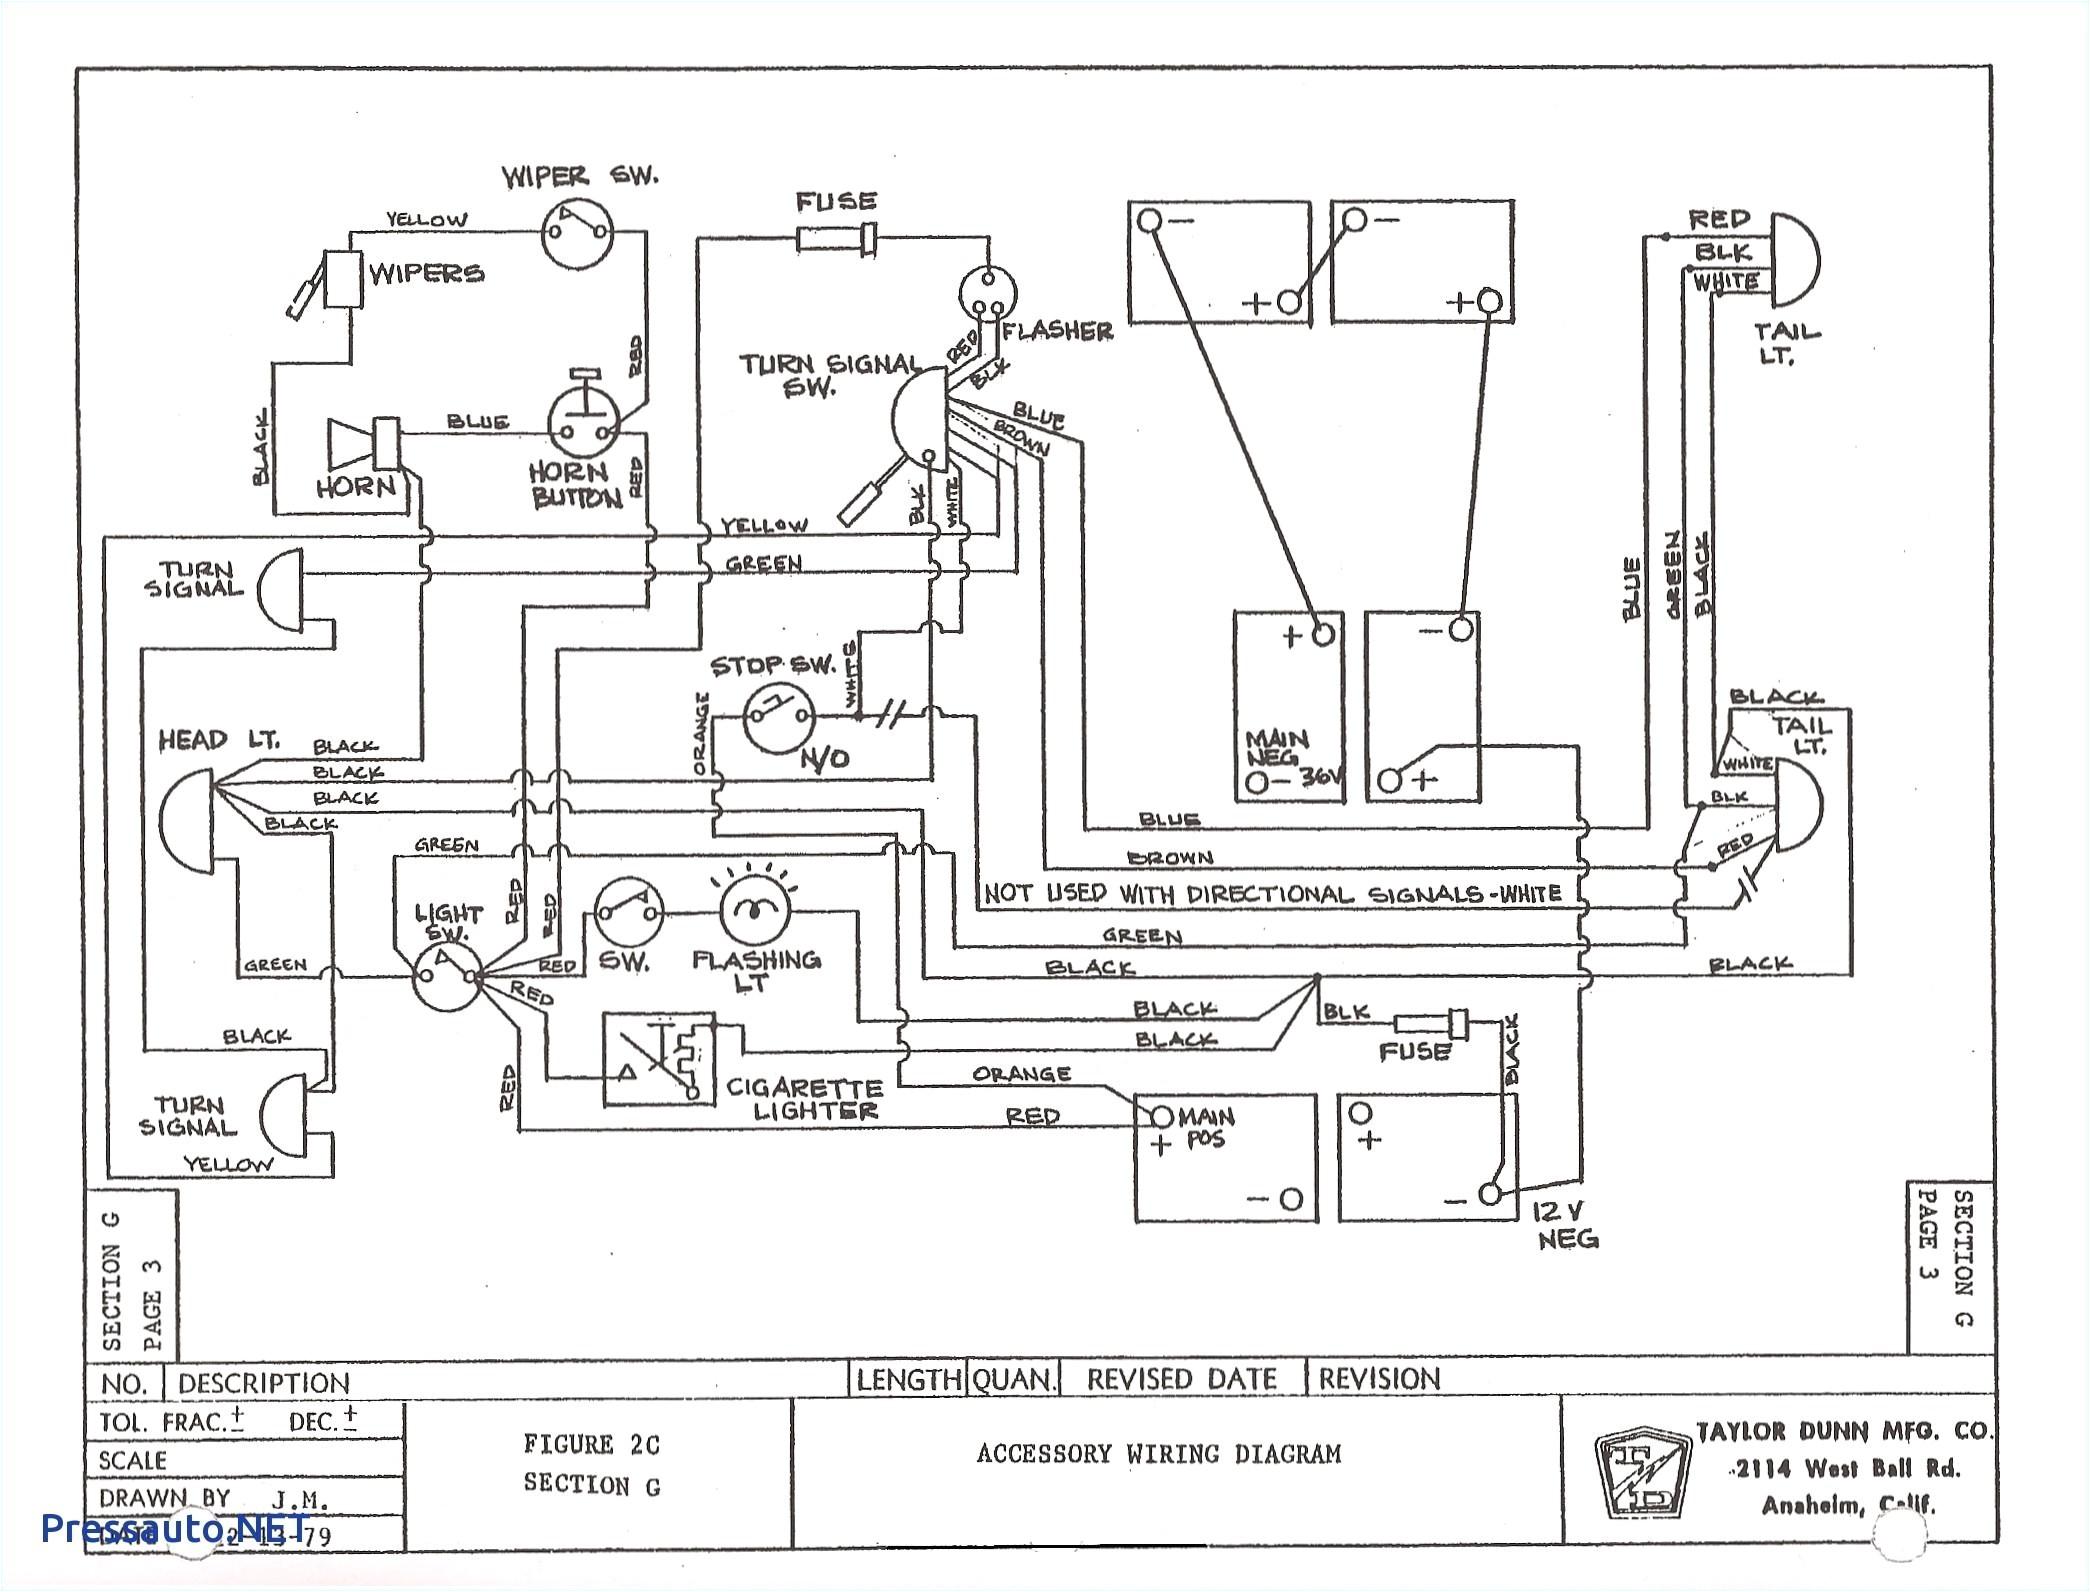 vintage golf cart wiring diagram wiring diagram technic vintage golf cart 36 volt ezgo wiring diagram